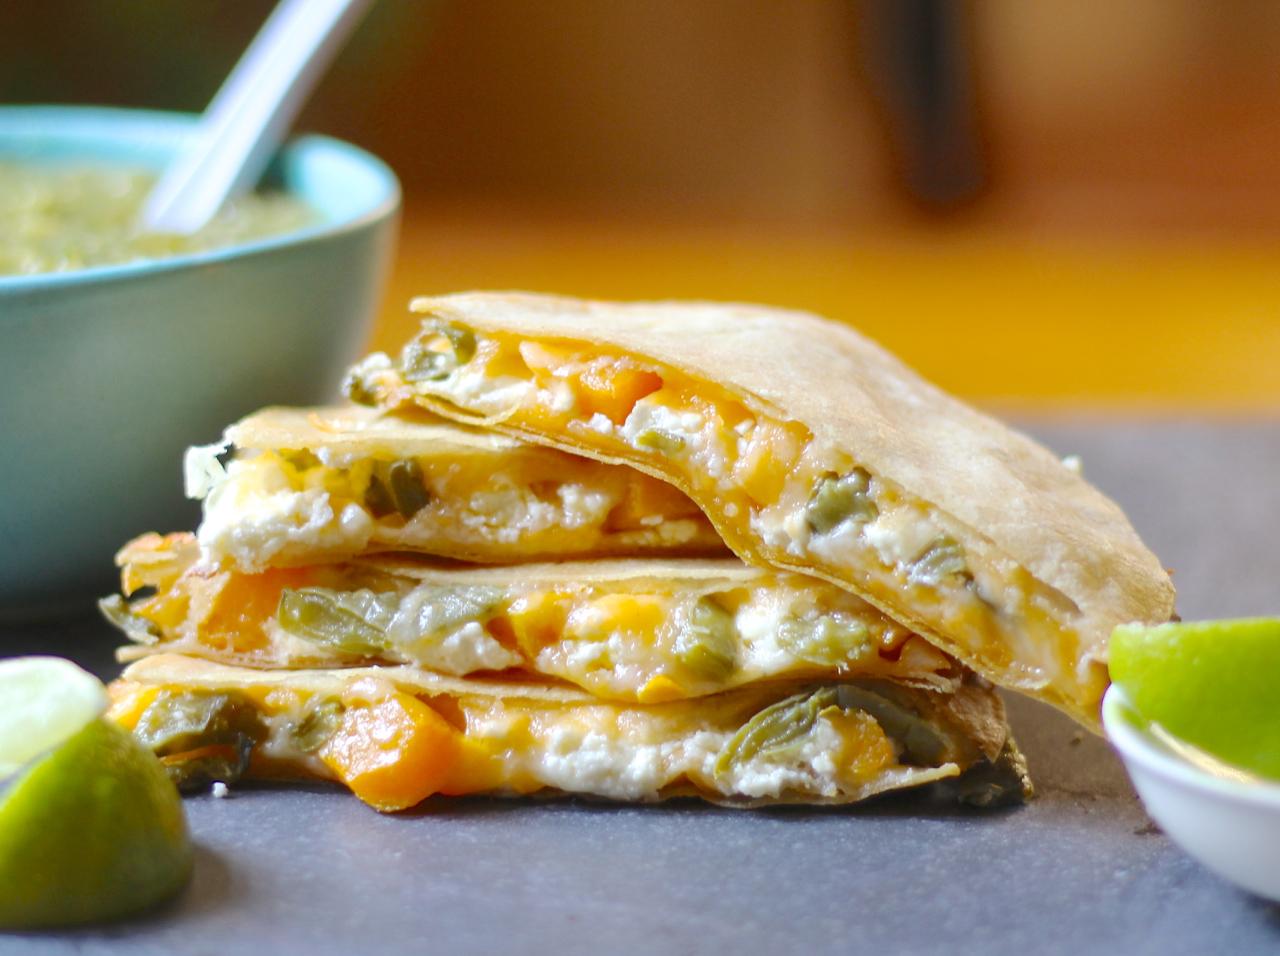 goat cheese quesadillas